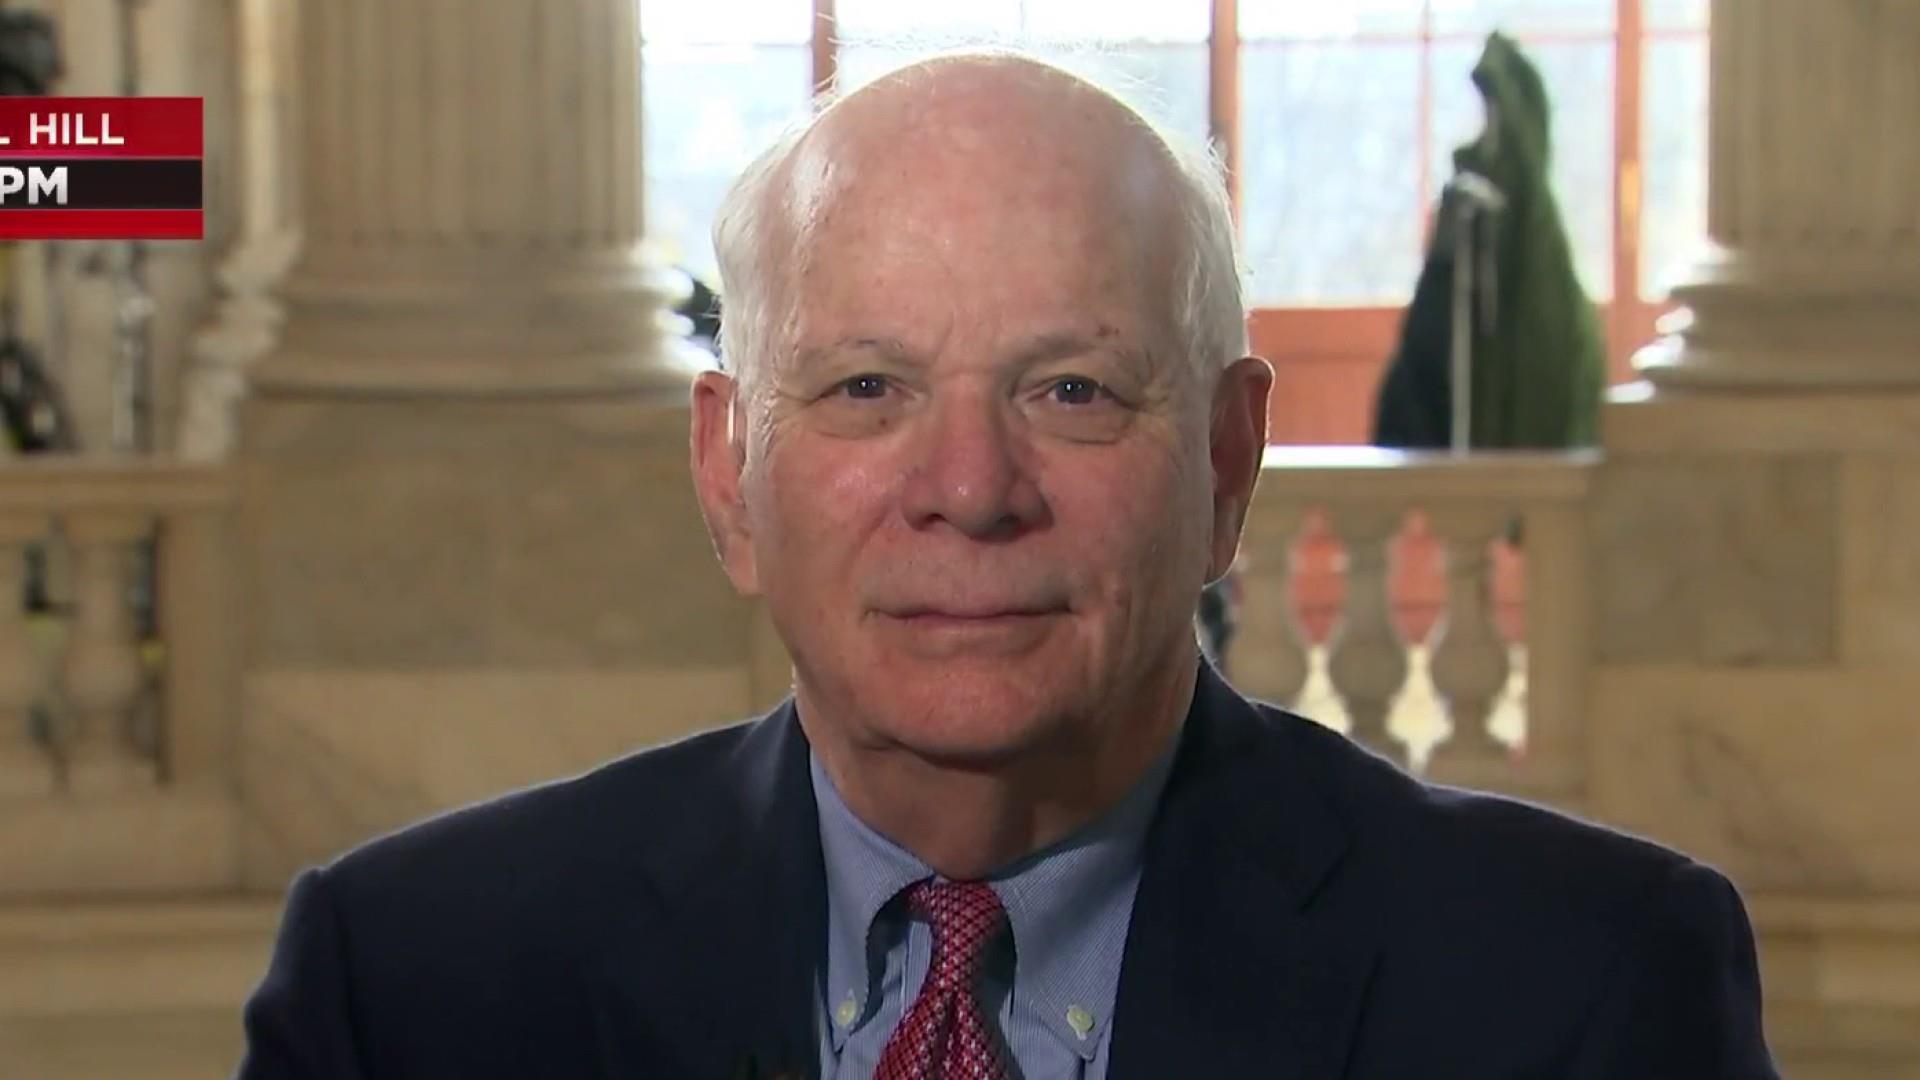 Senator Cardin: Let's spend money where it needs to be spent